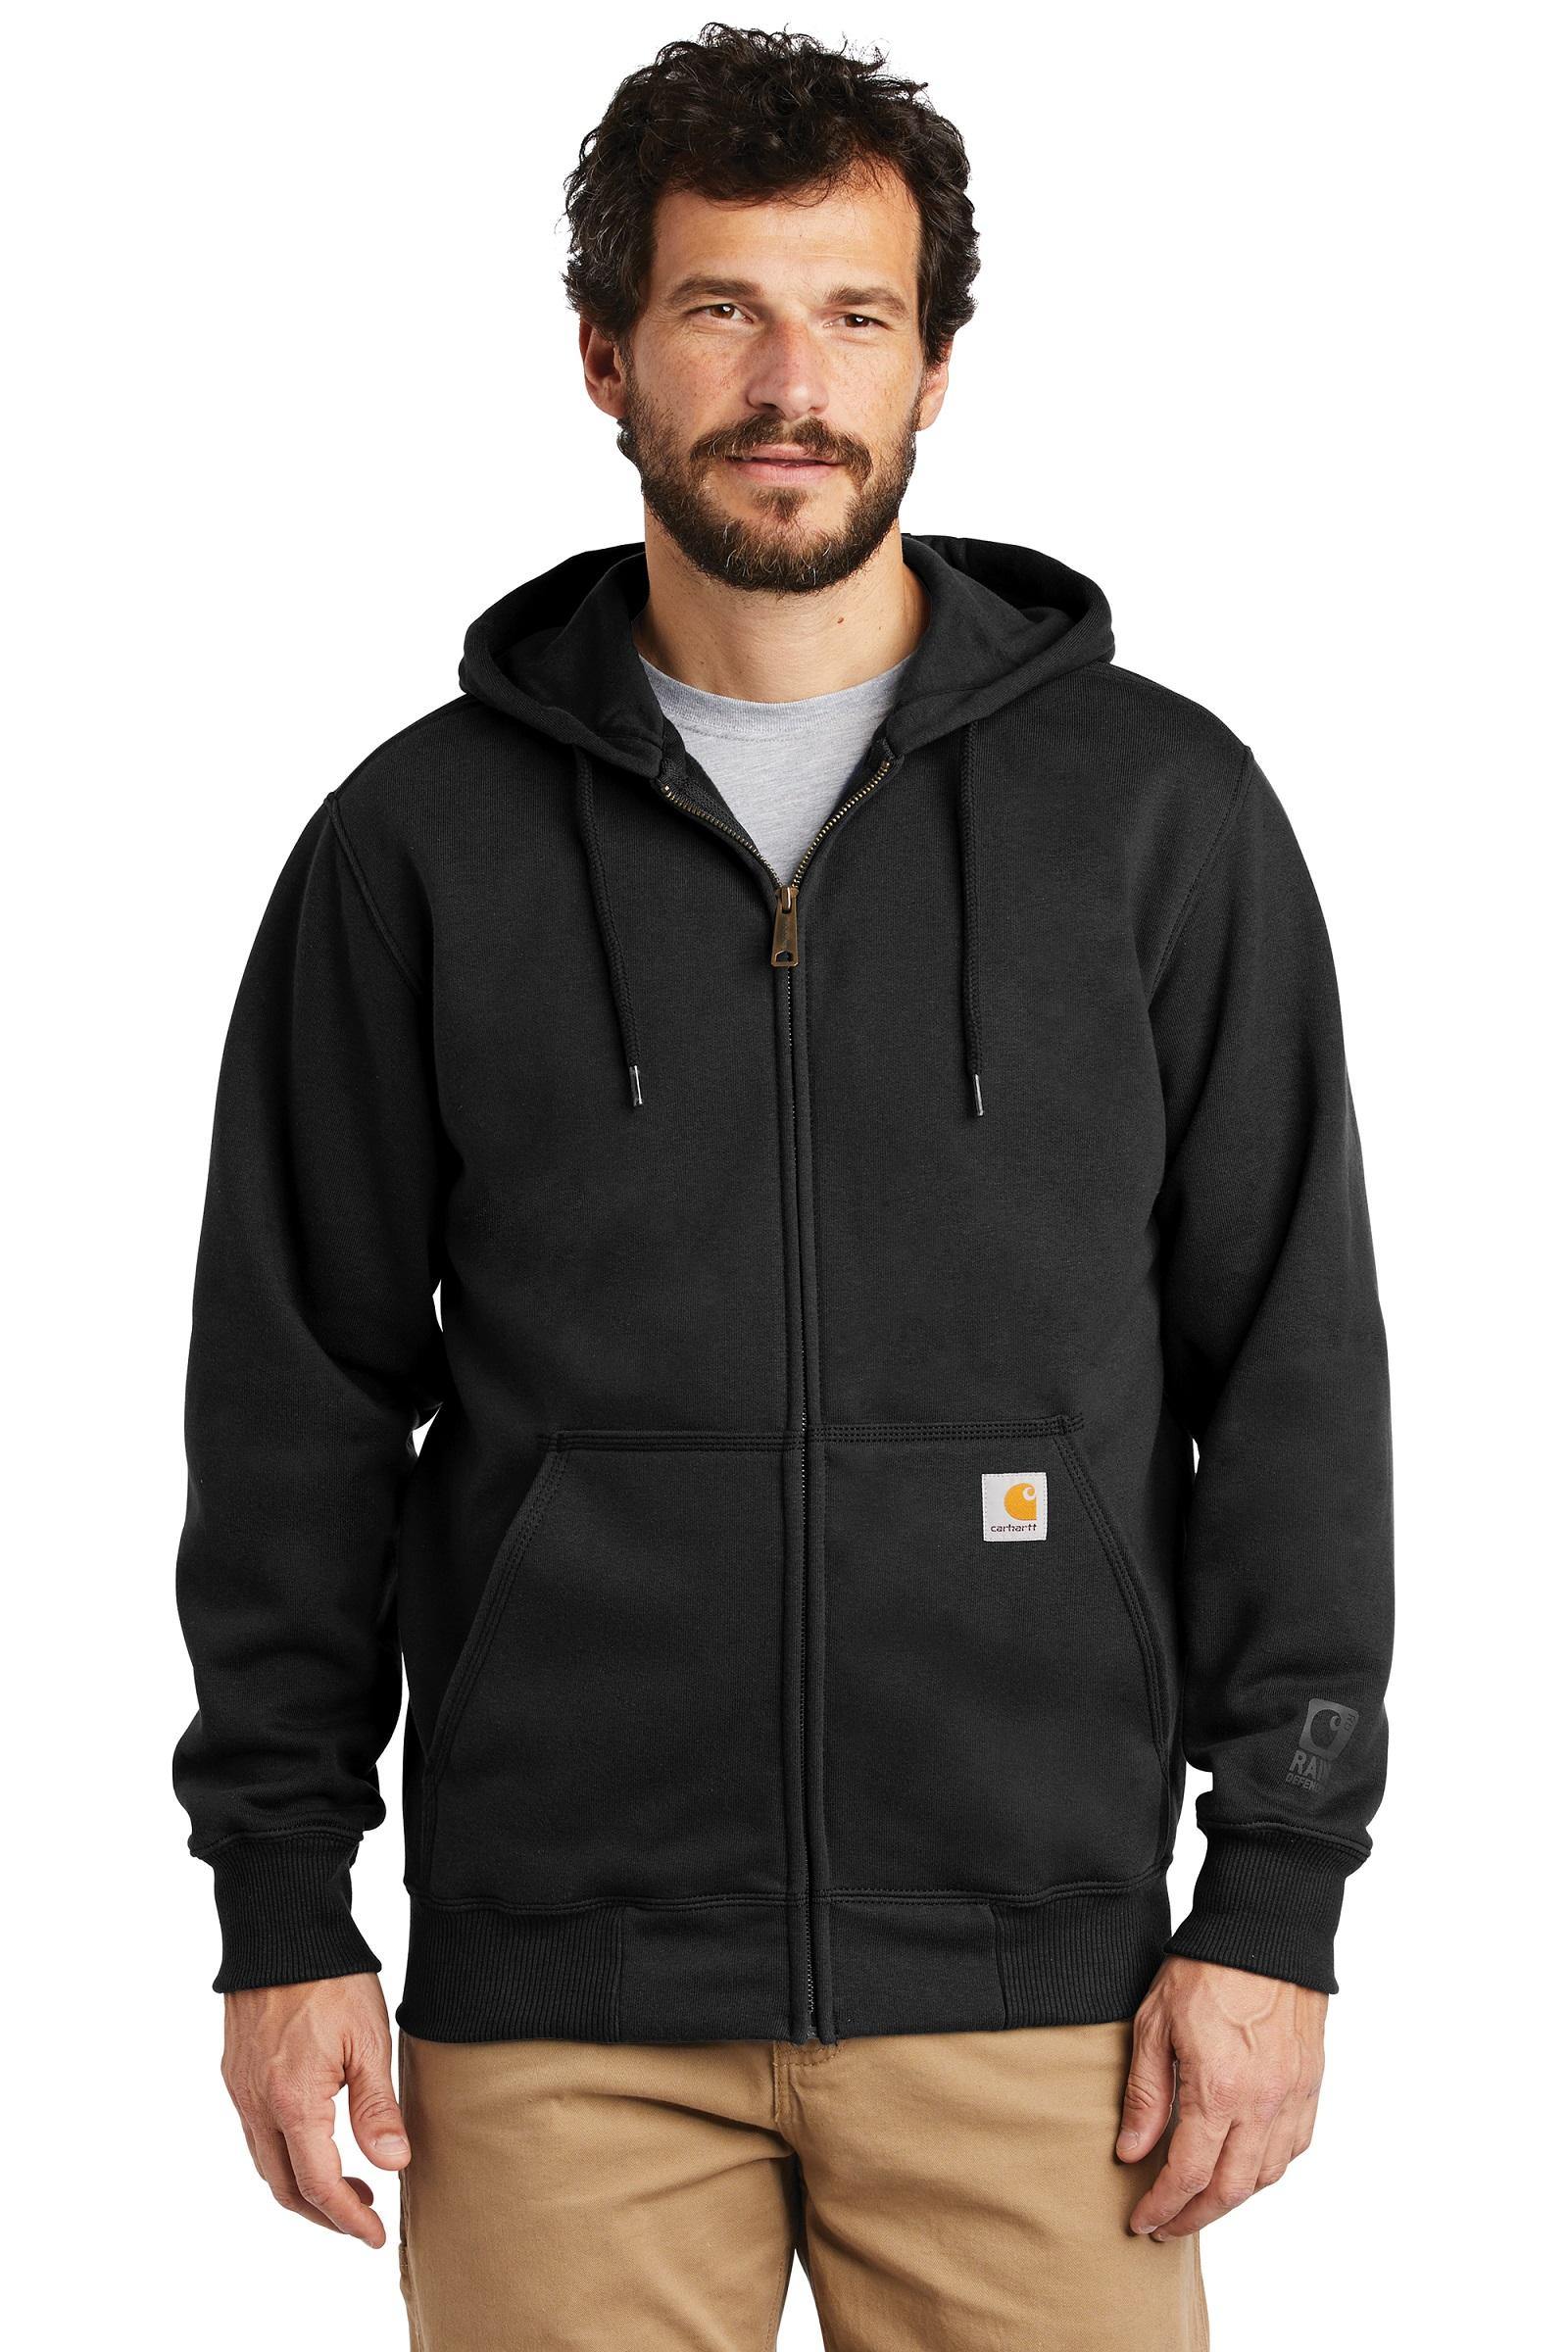 Carhartt Embroidered Paxton Rain Defender Hooded Zip Sweatshirt